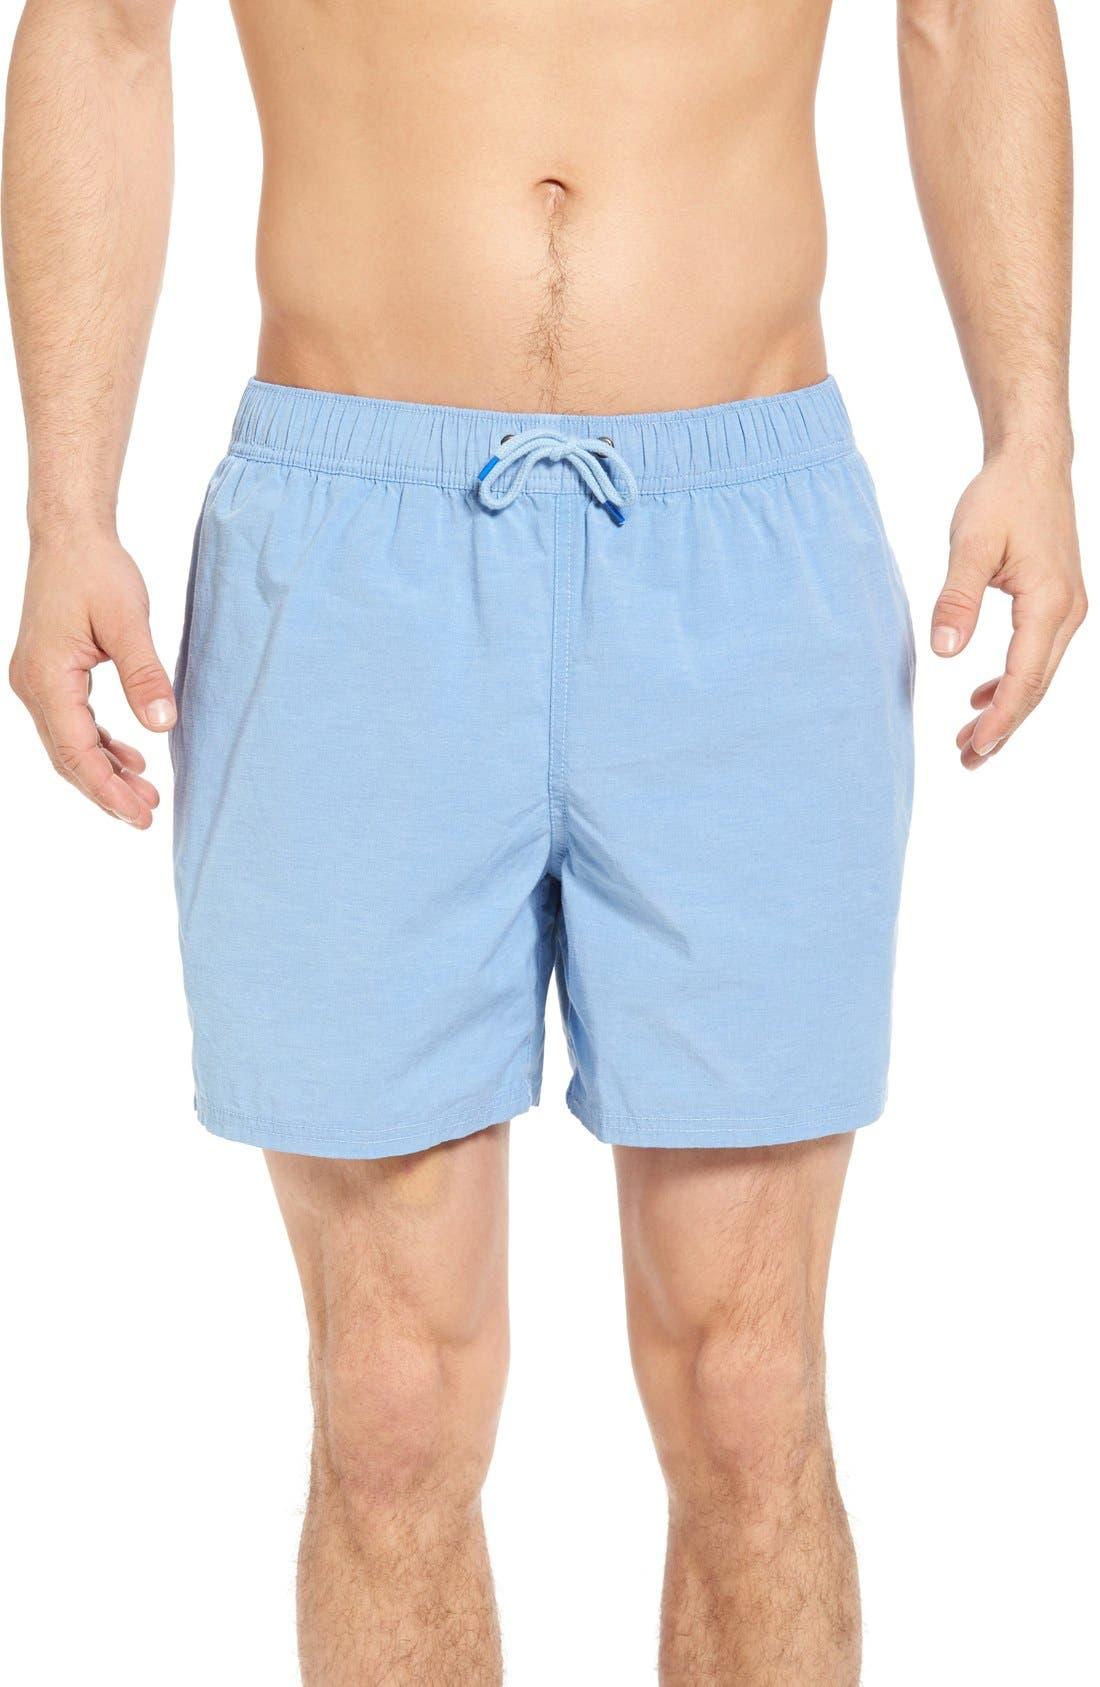 ORIGINAL PAPERBACKS Waikiki Board Shorts